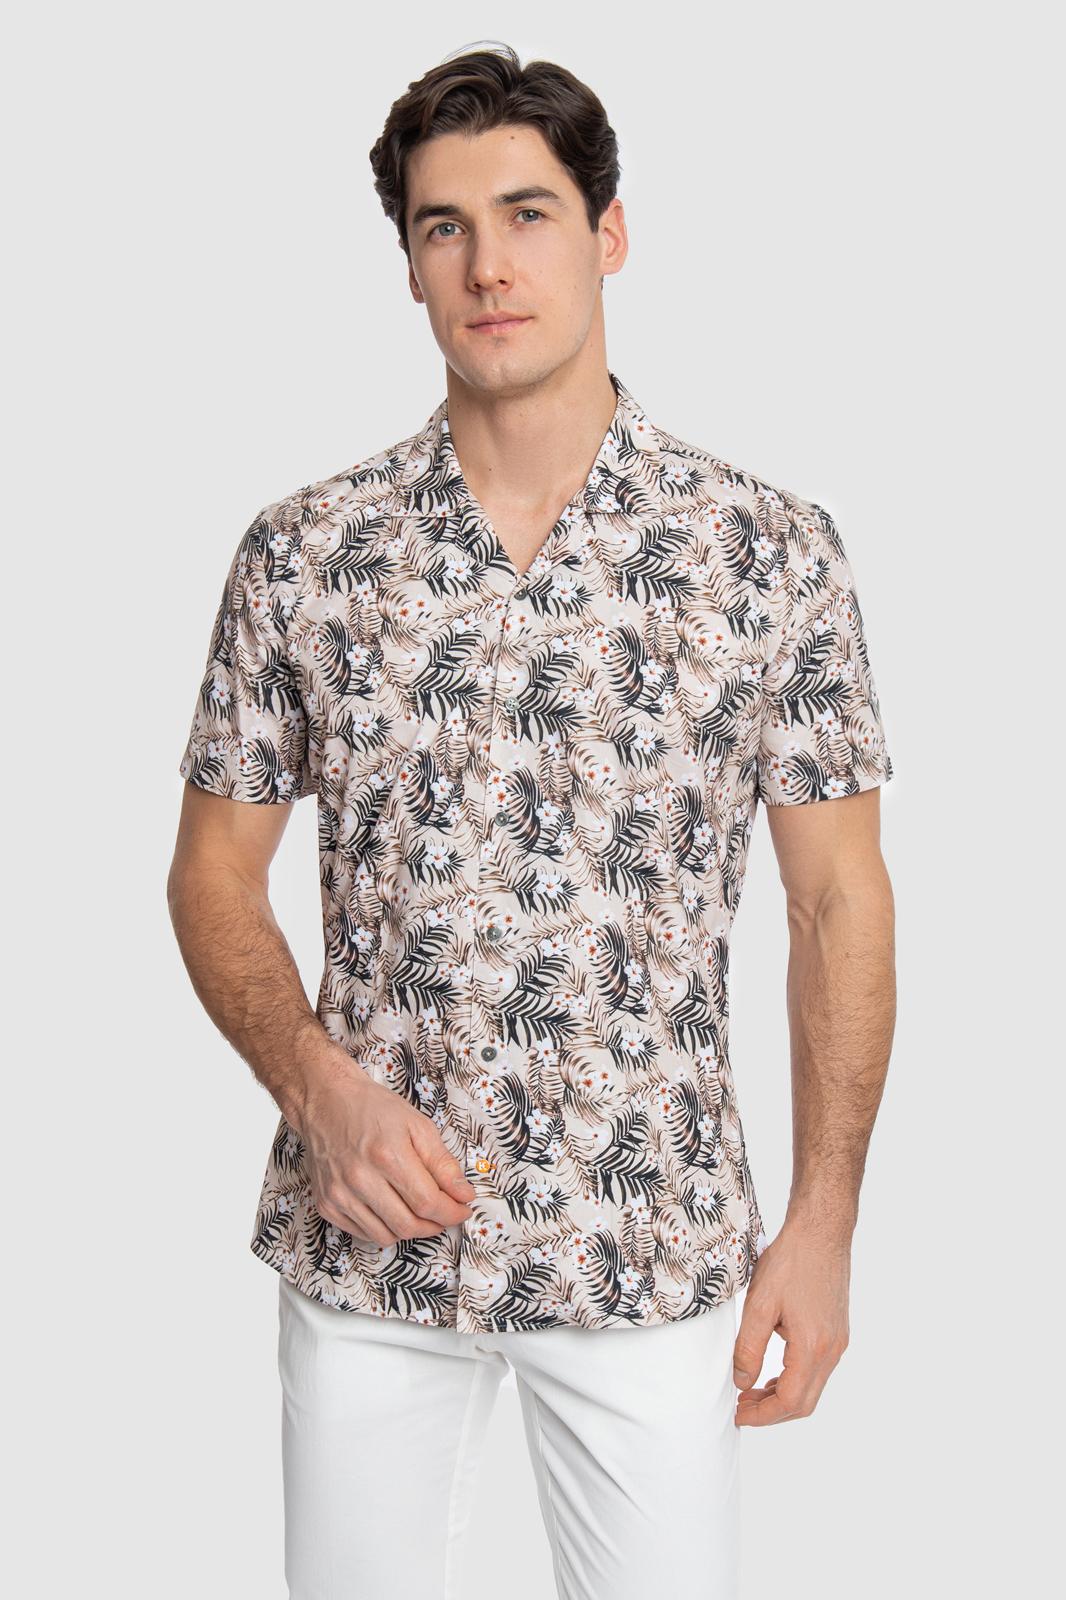 Kanzler Рубашка приталенная из хлопка с коротким рукавом KANZLER